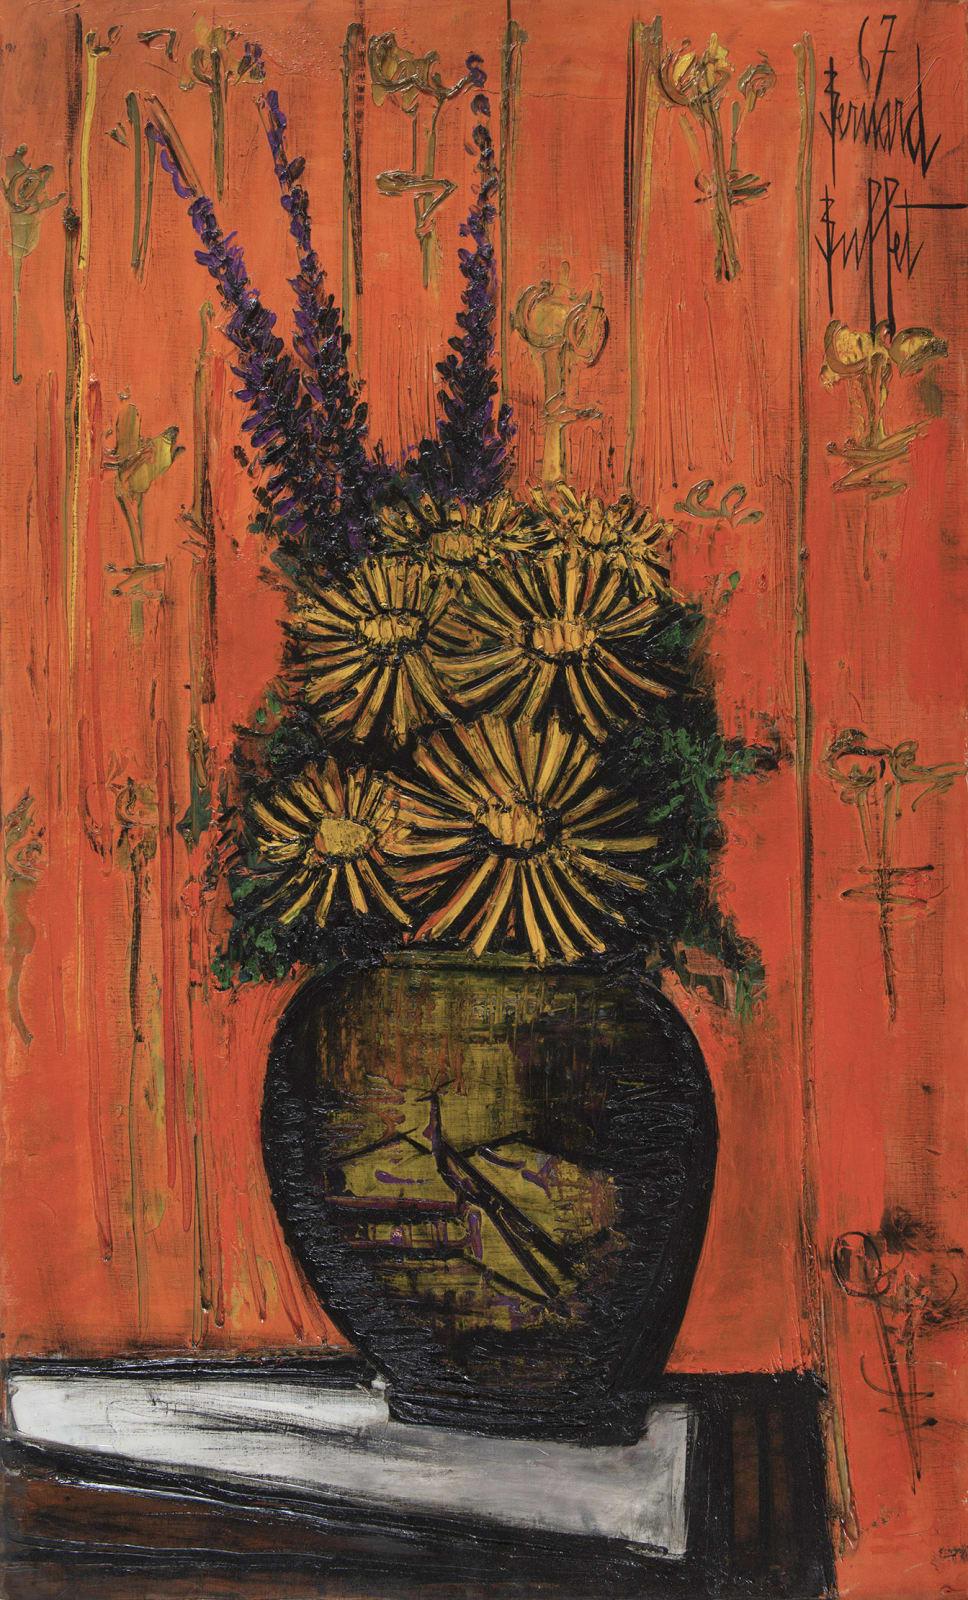 BERNARD BUFFET, Bouquet au vase chinois, fond orange, 1967